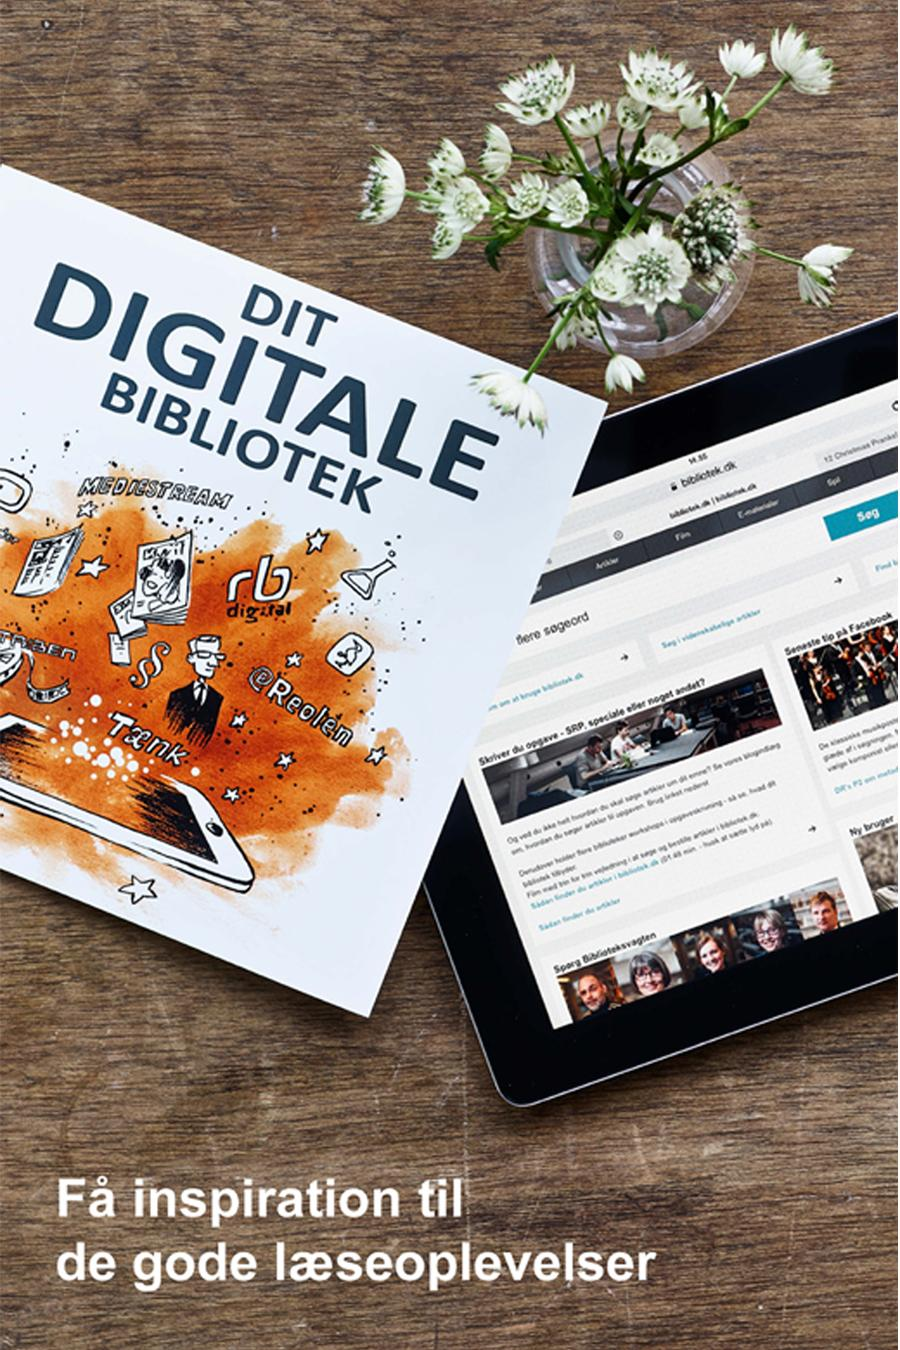 Dit digitale biblioek